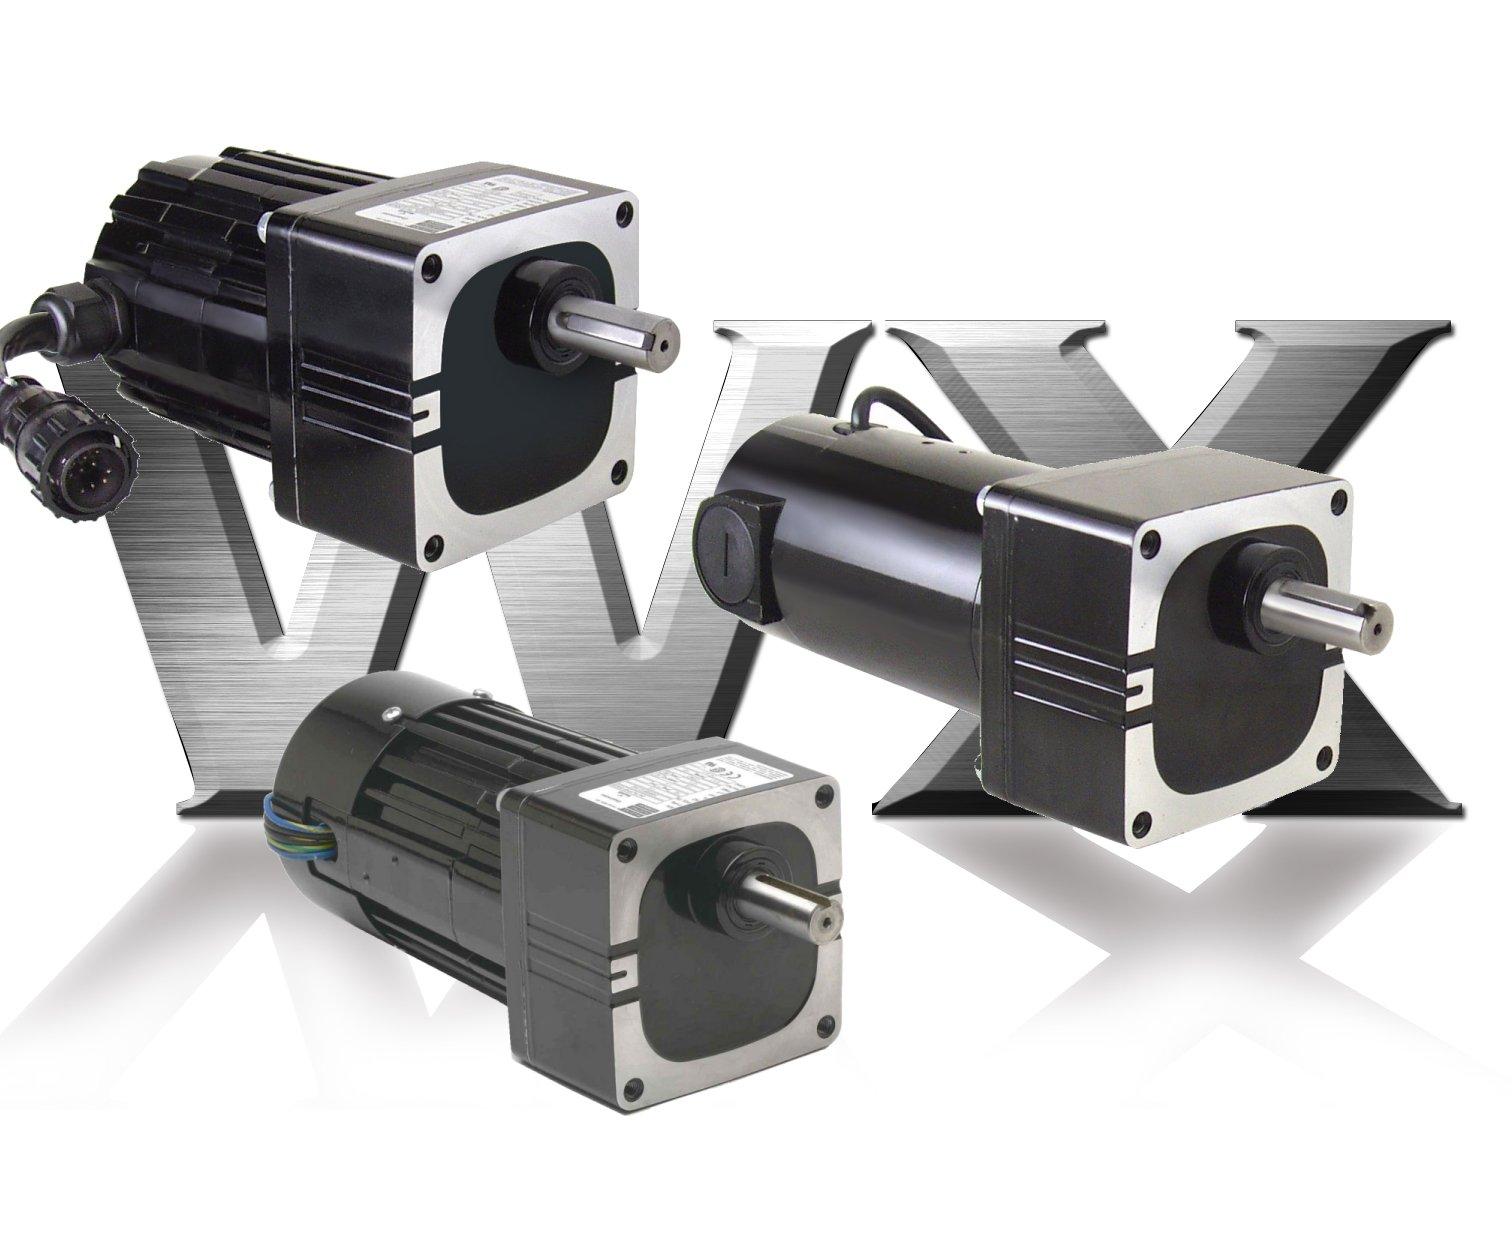 Bodine's New WX Gearmotors - 100+ New Stock Models